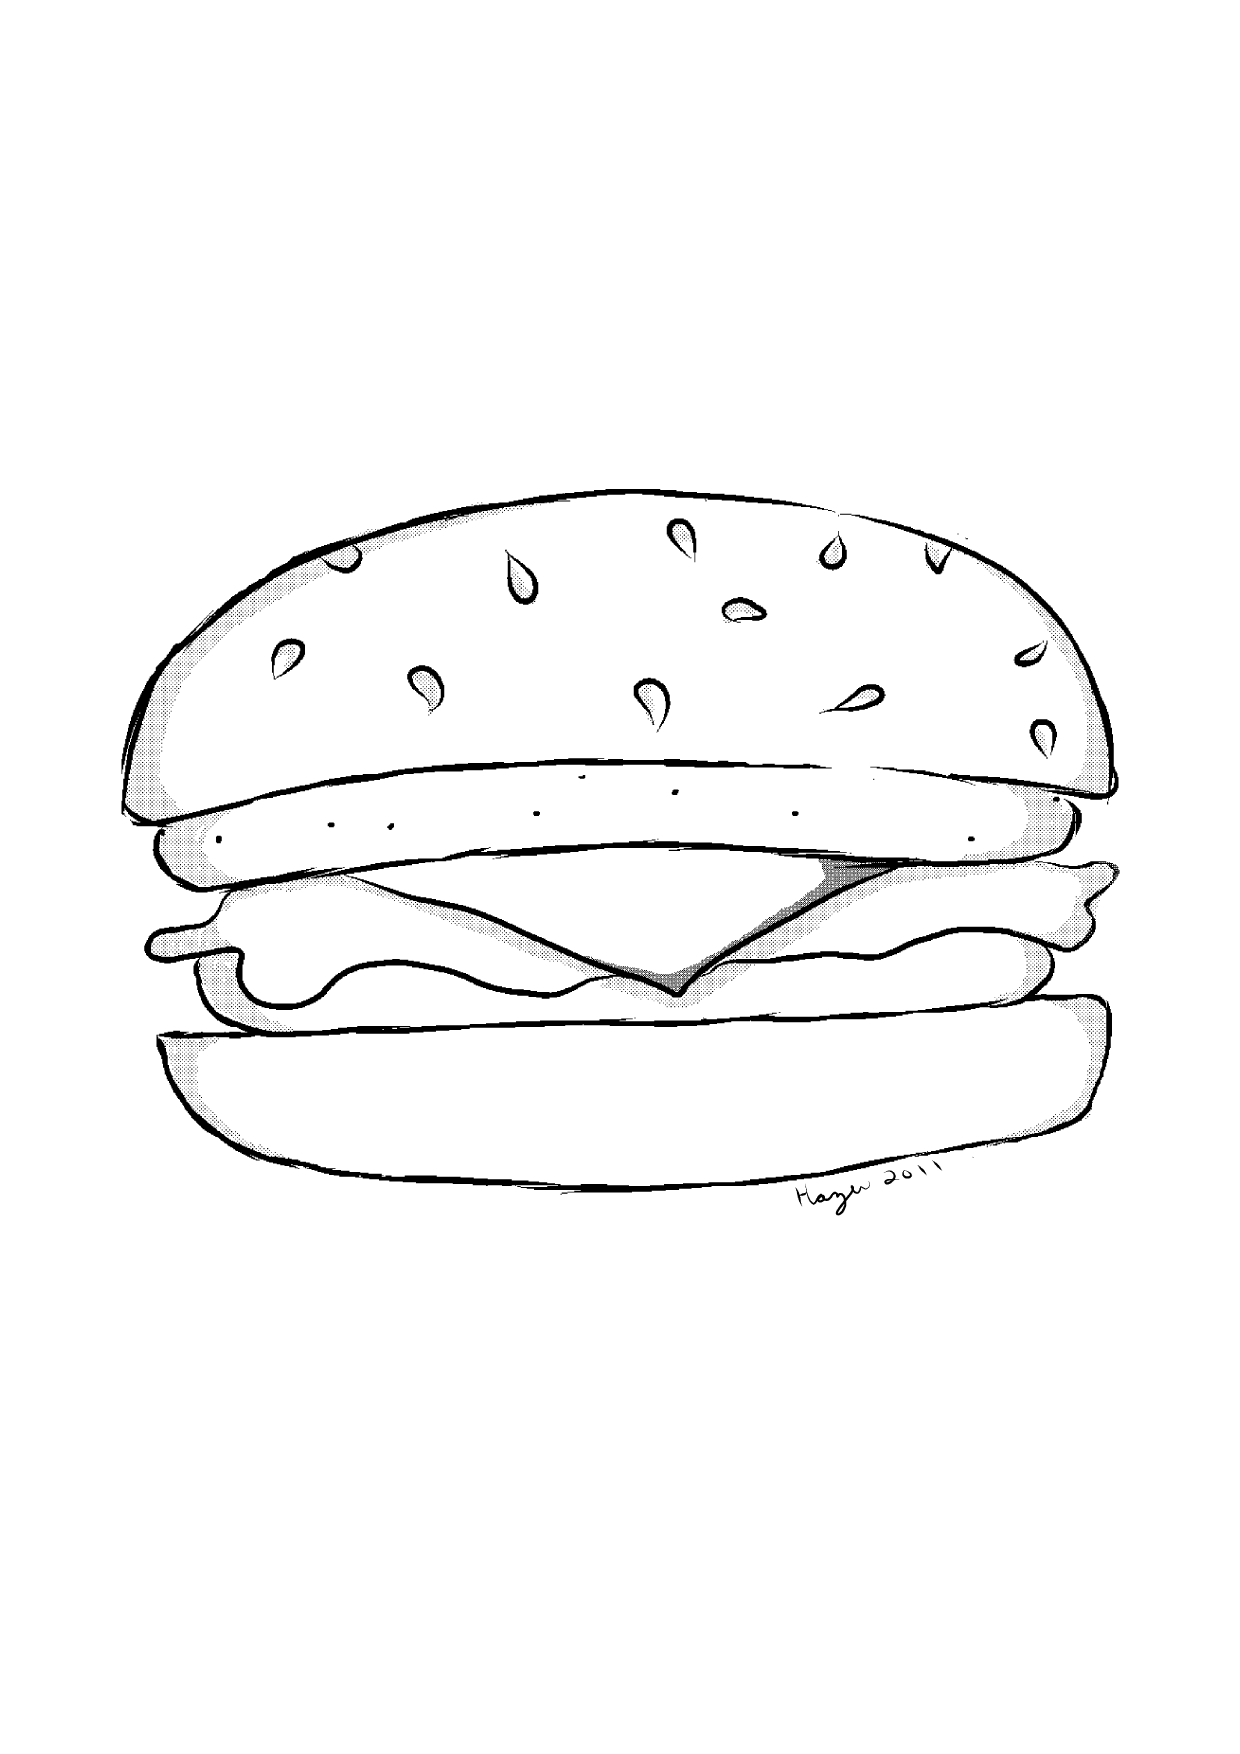 Cheeseburger - Line Art by Hazuhazuheavn on DeviantArt